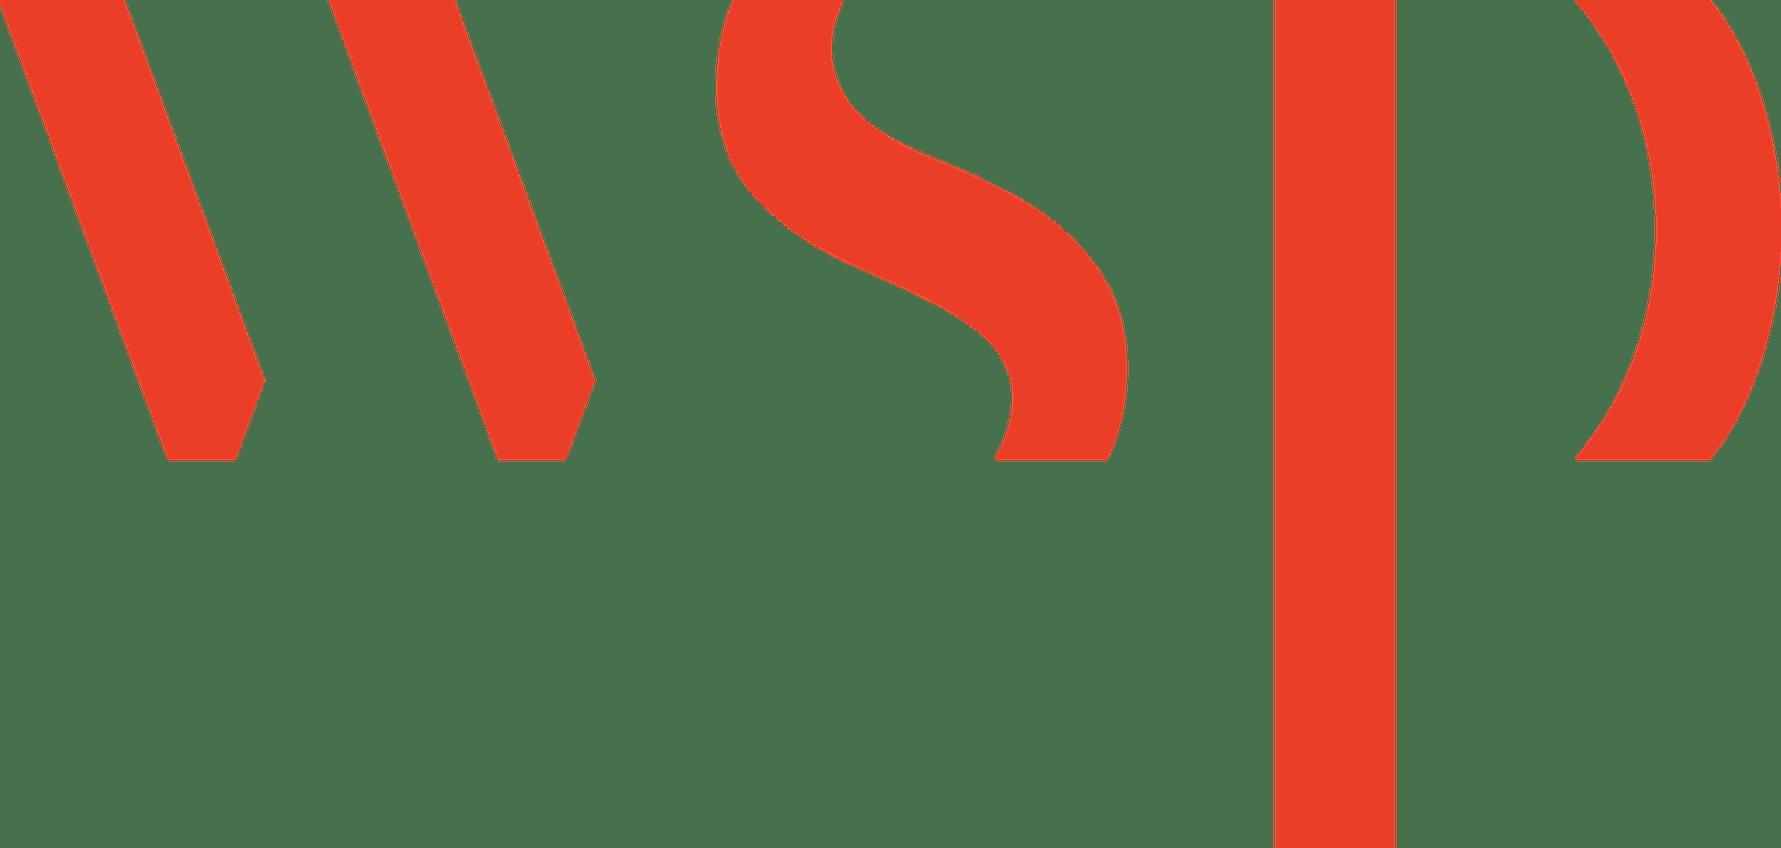 Elliot-Glassman-logo-2.png